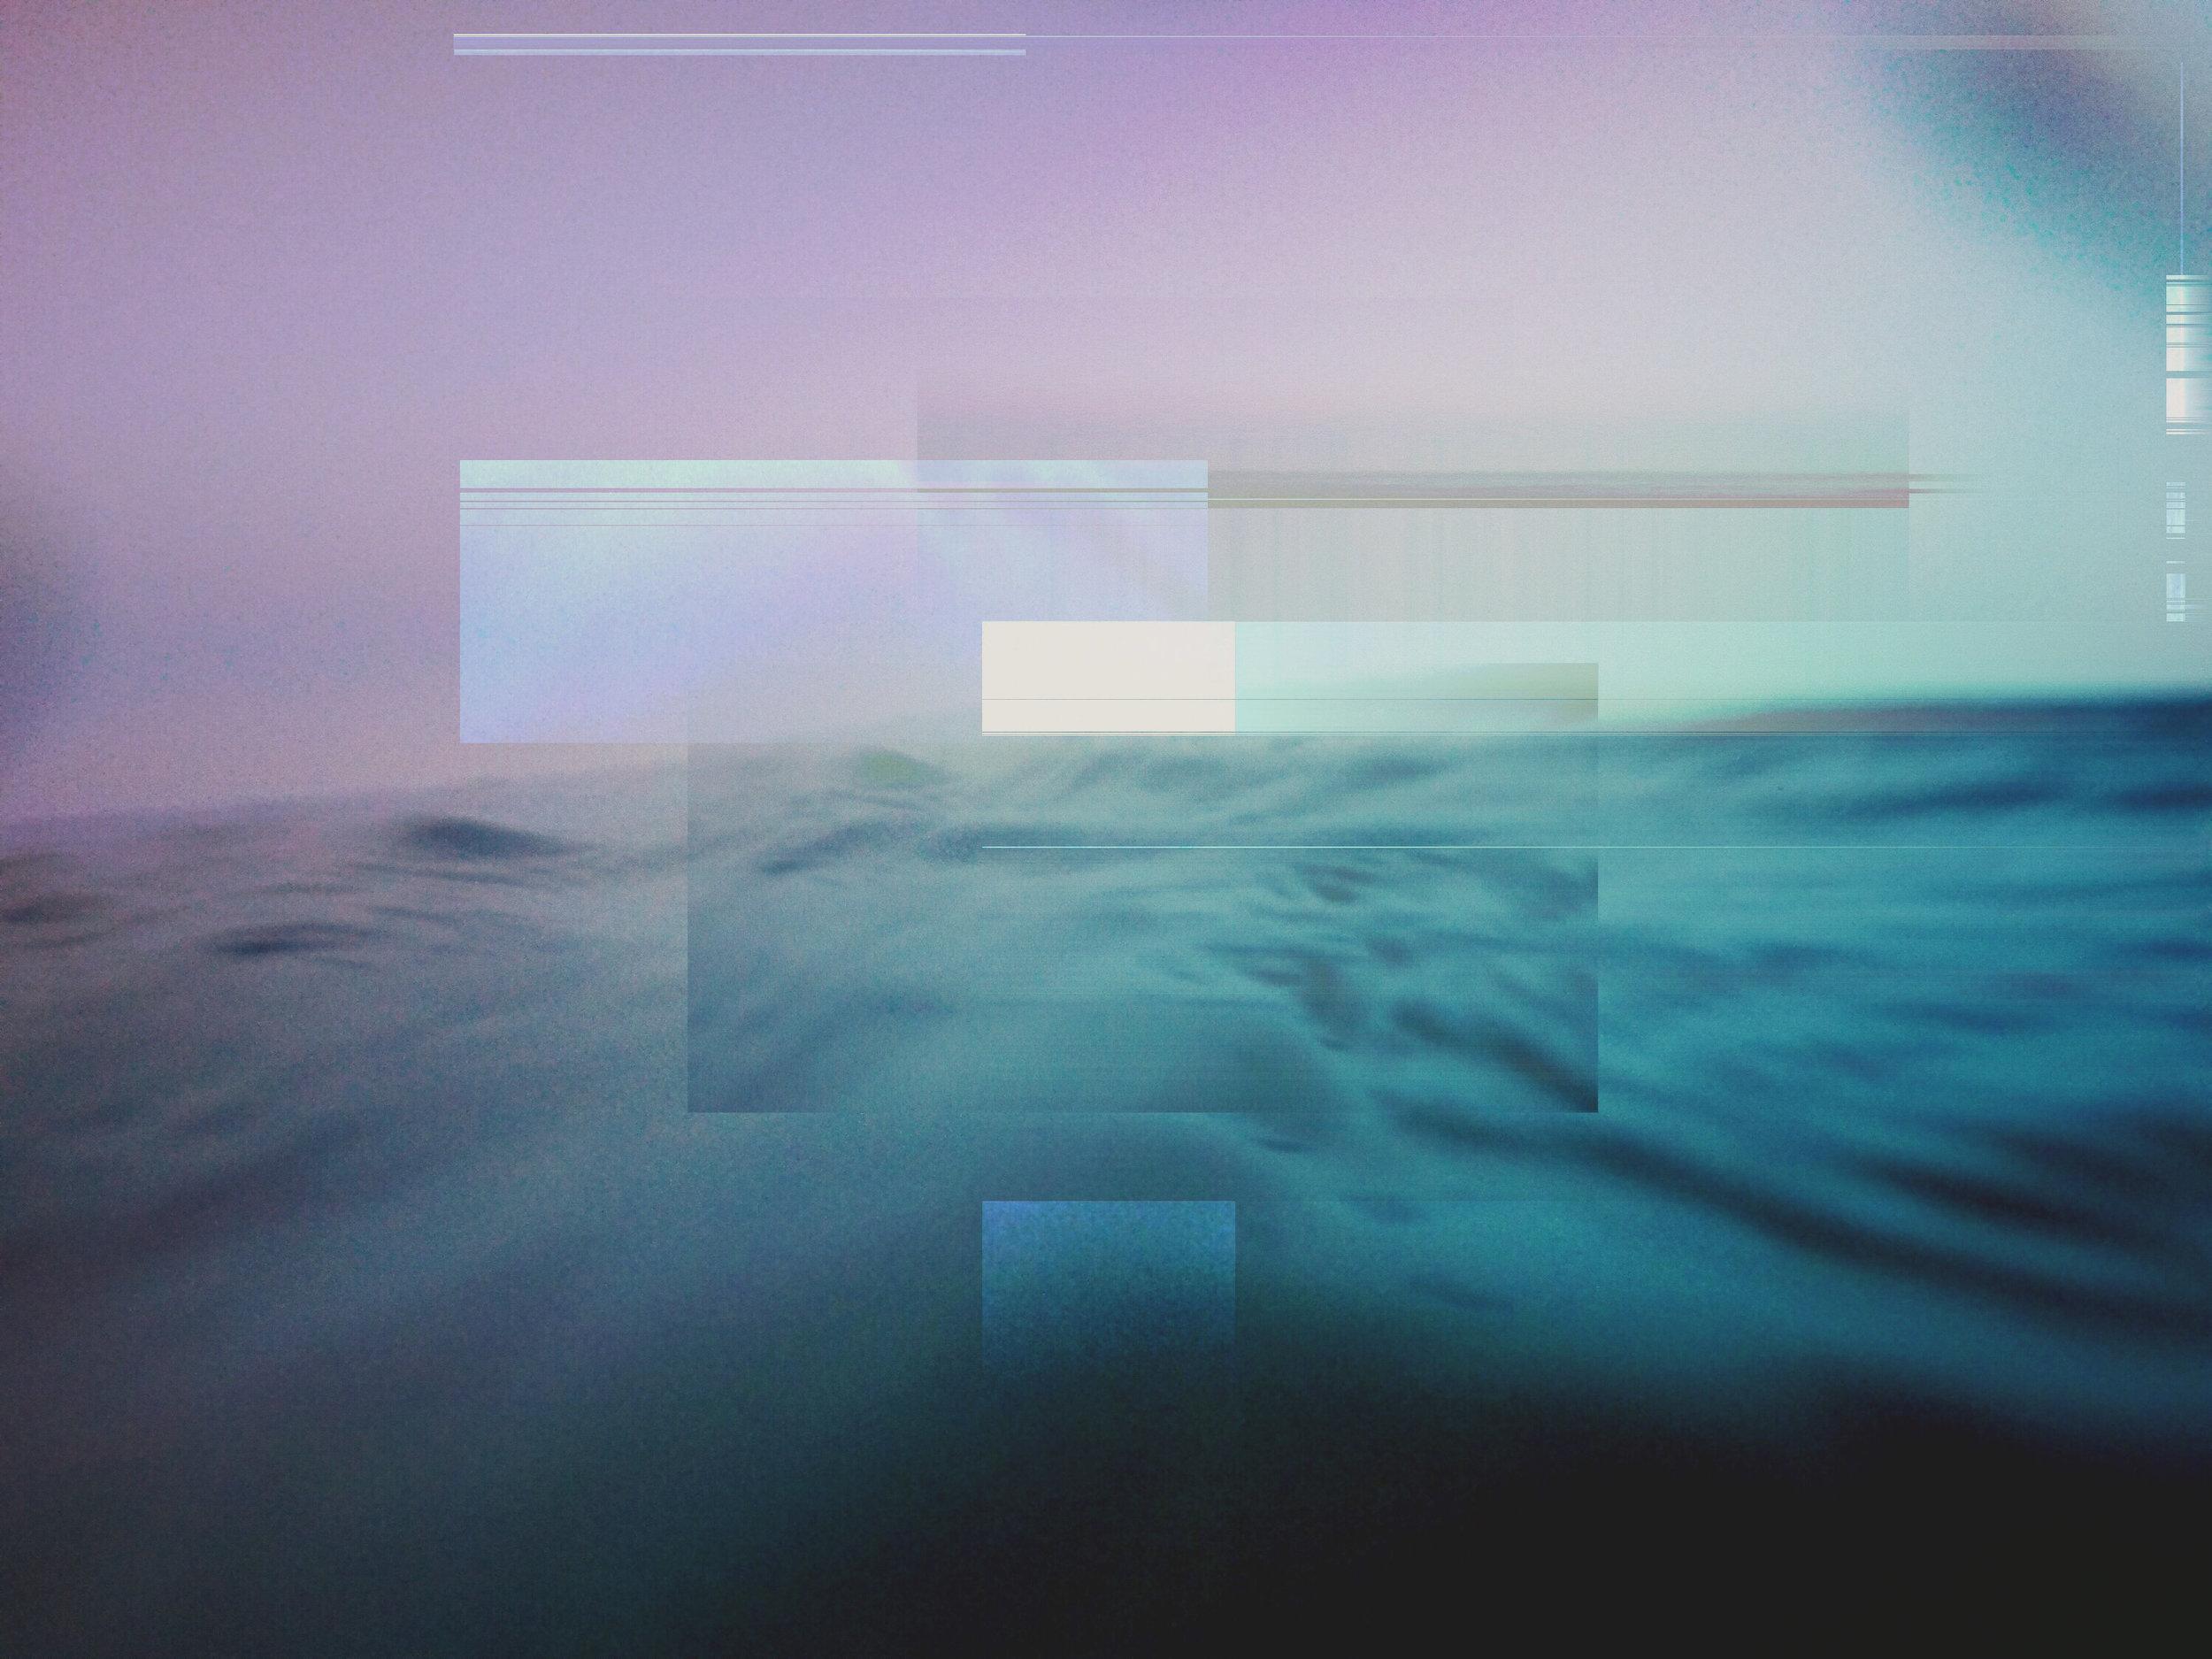 jlaurence_glitch-43.jpg